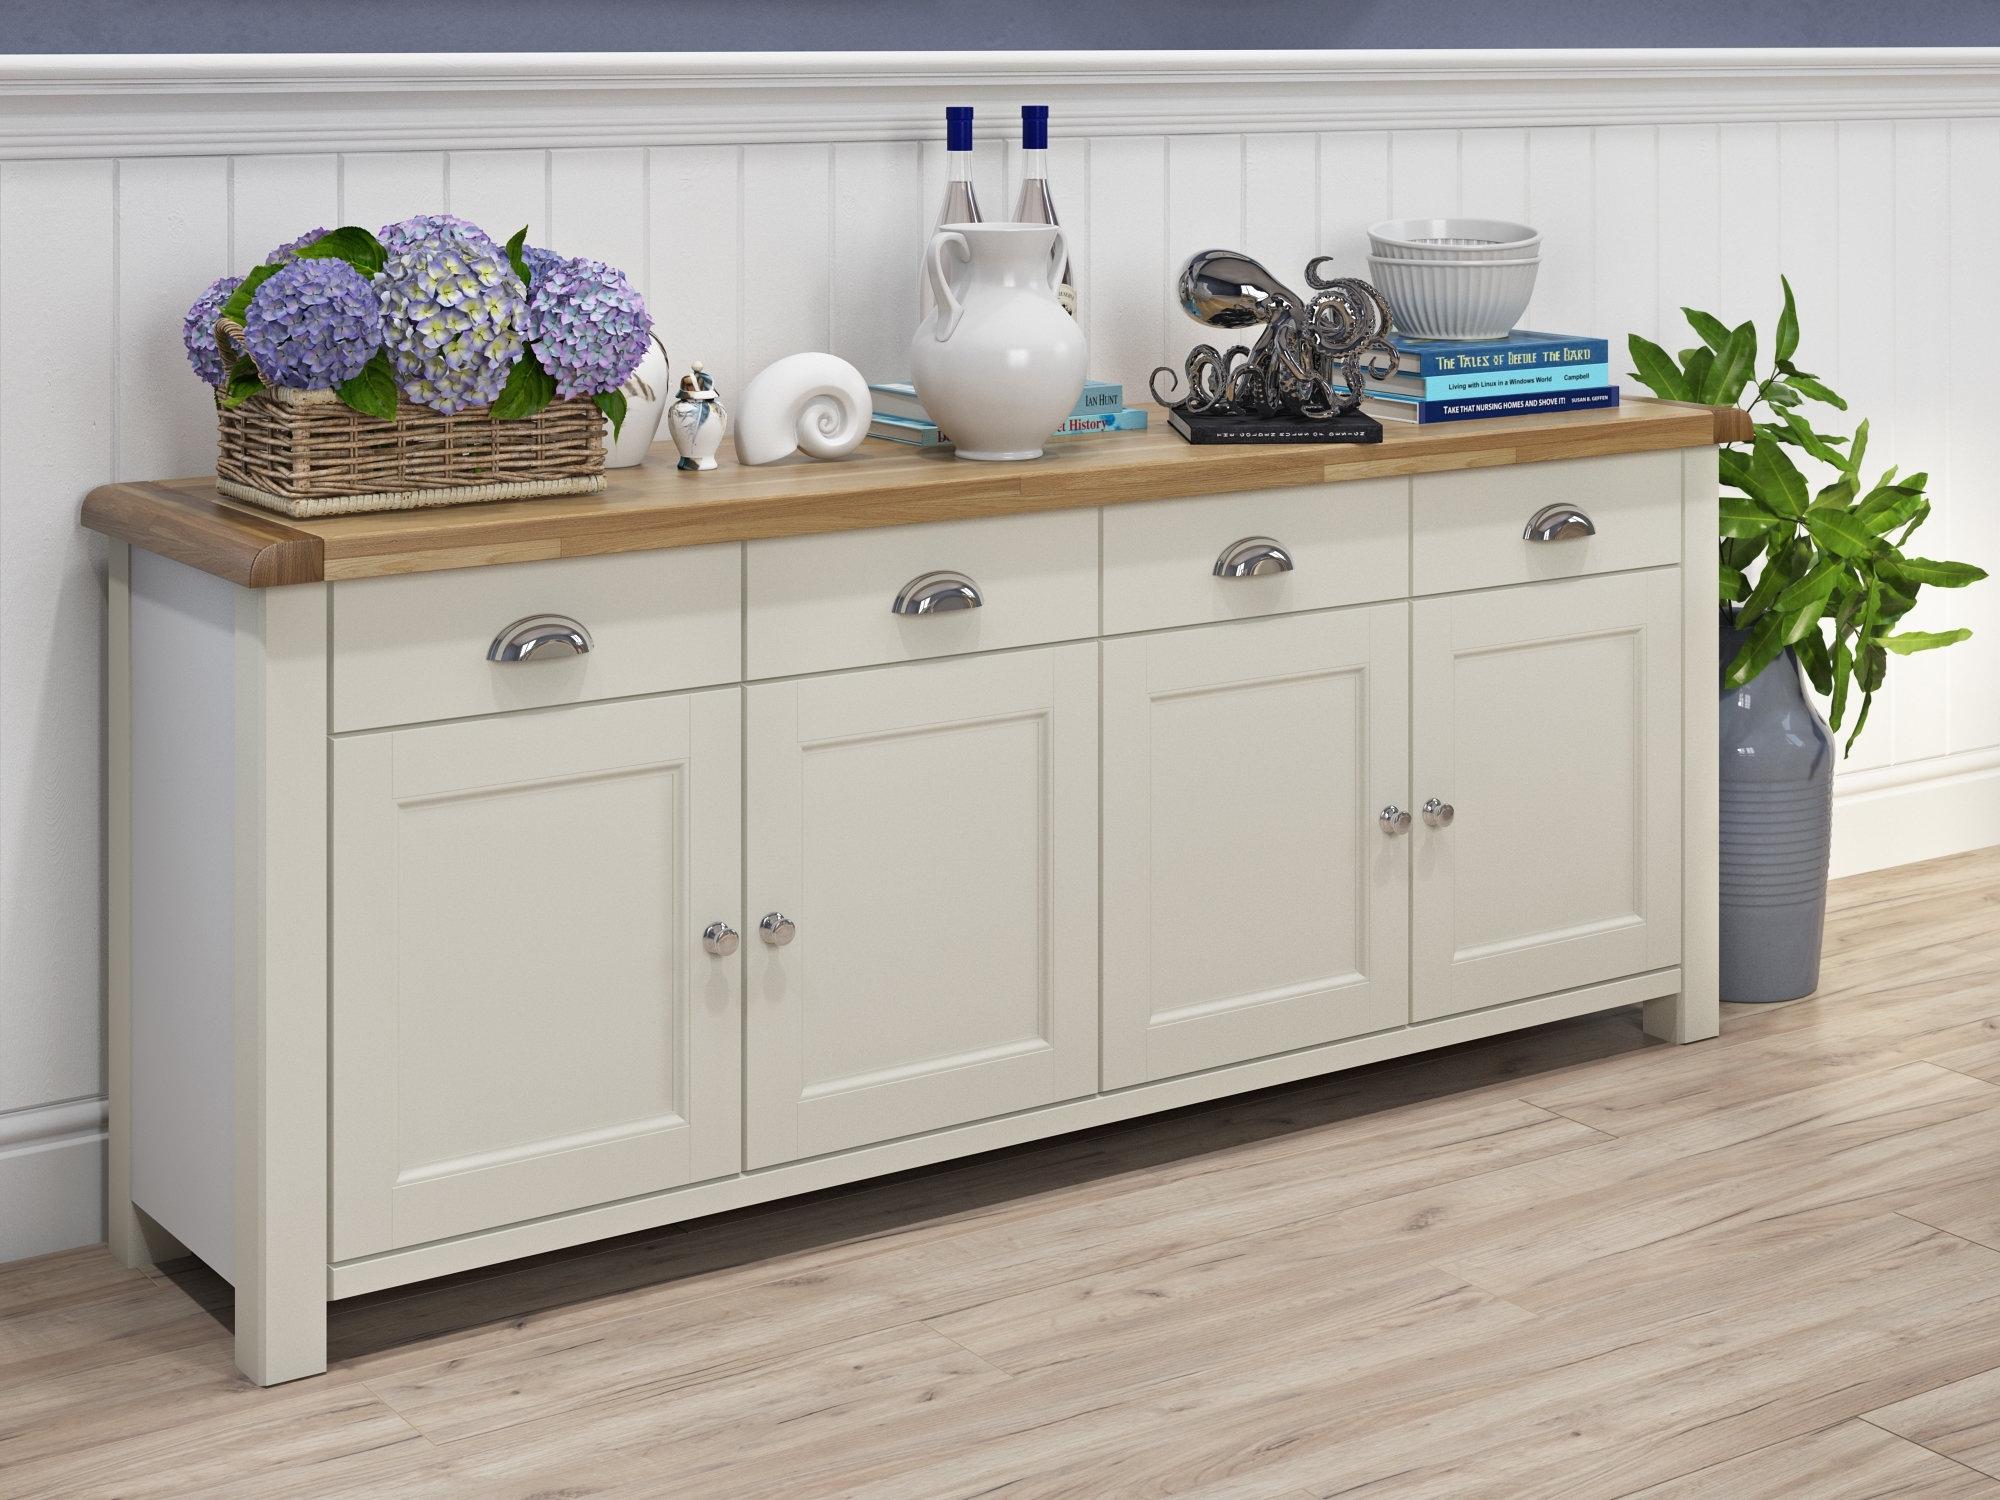 Beachcrest Home Sanford Sideboard & Reviews | Wayfair.co.uk regarding 4-Door 4-Drawer Metal Inserts Sideboards (Image 3 of 30)